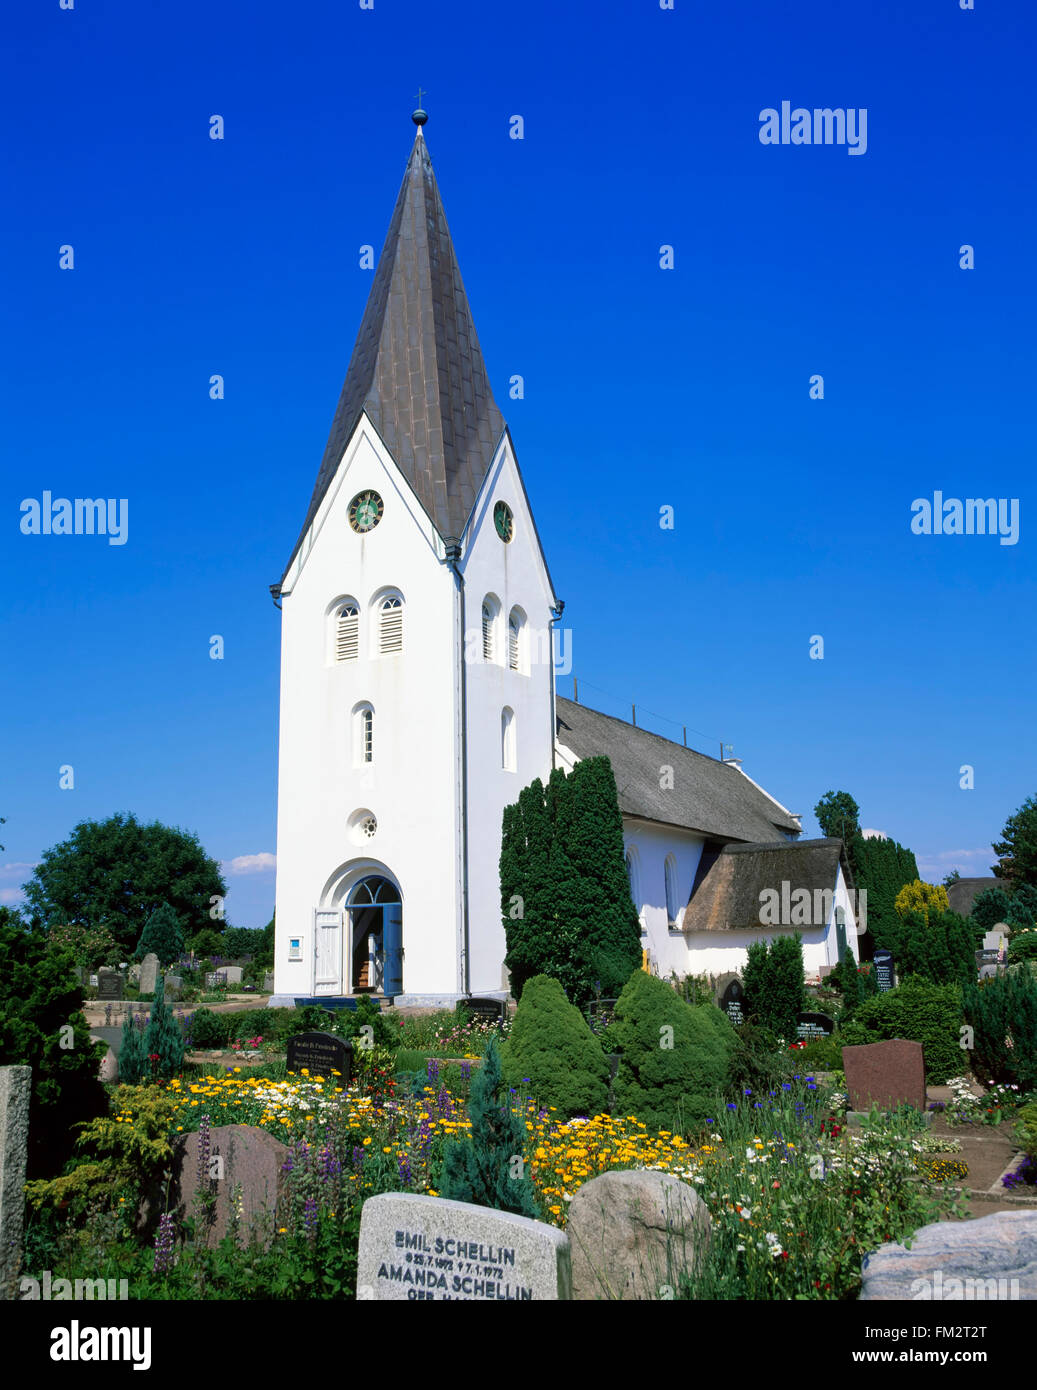 Clemens church in Nebel, Amrum island, North Sea, Schleswig-Holstein, Germany, Europe - Stock Image